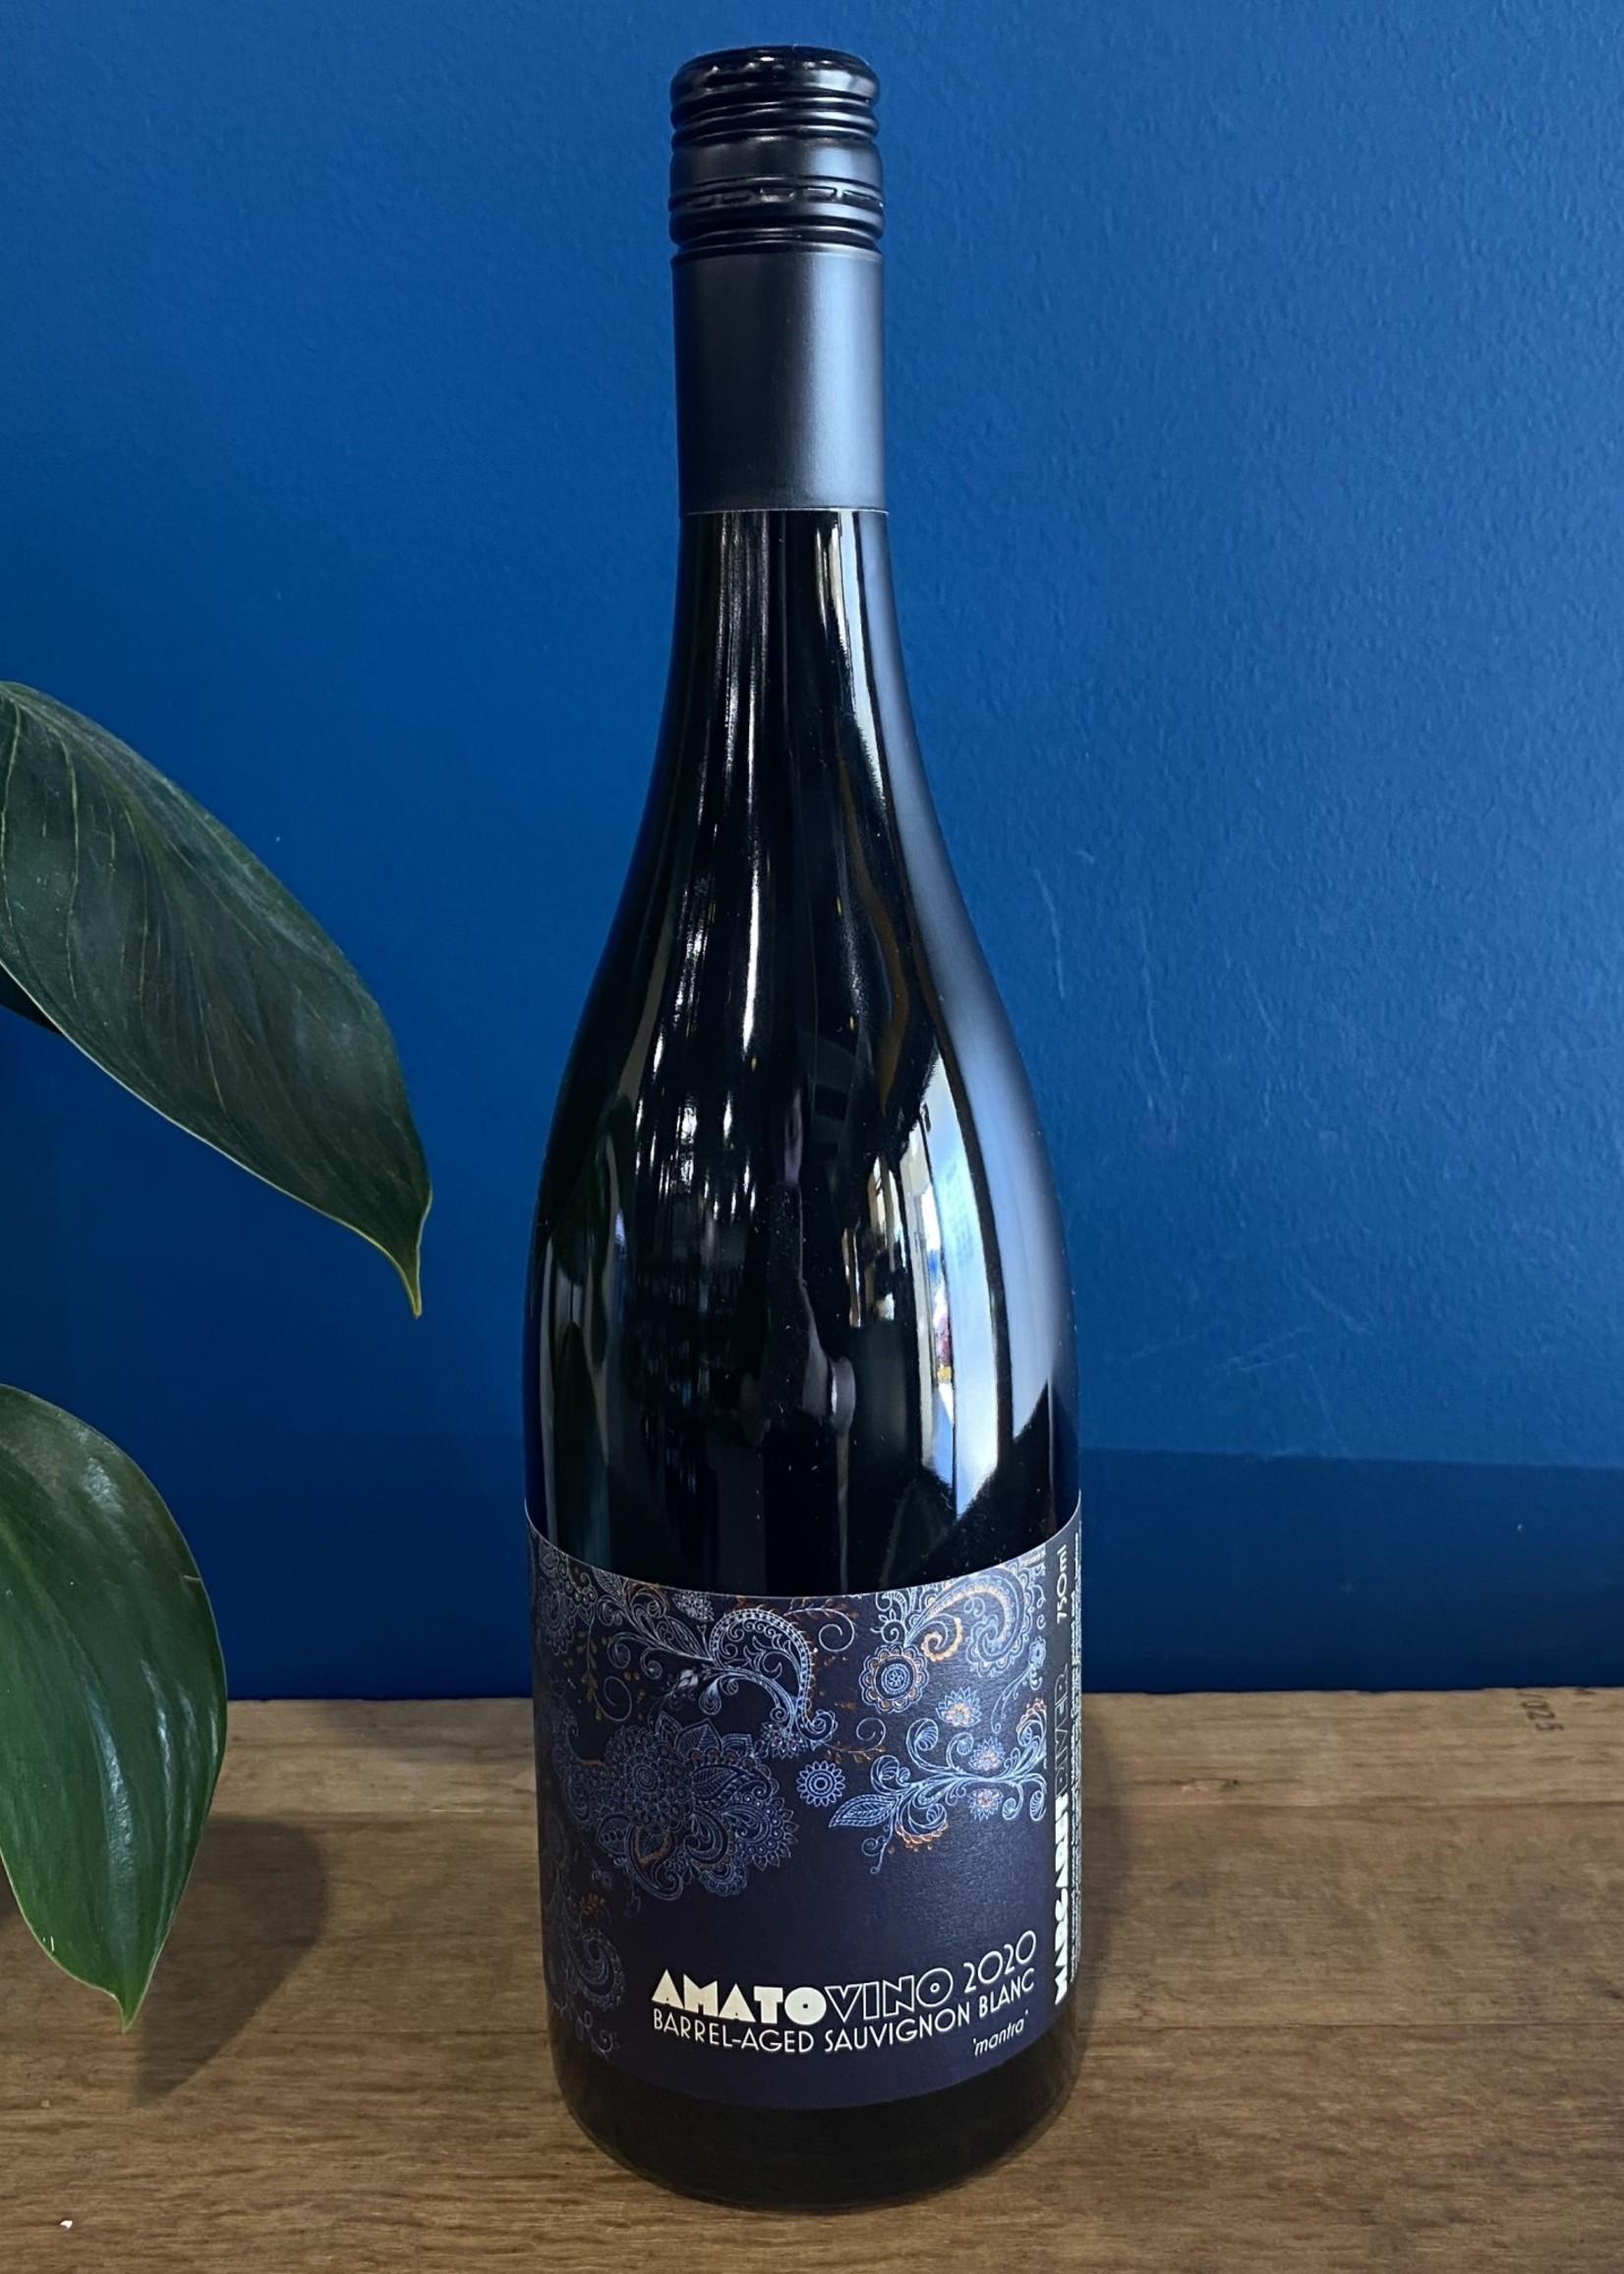 Amato Vino Amato Vino Barrel Aged Sauvignon Blanc